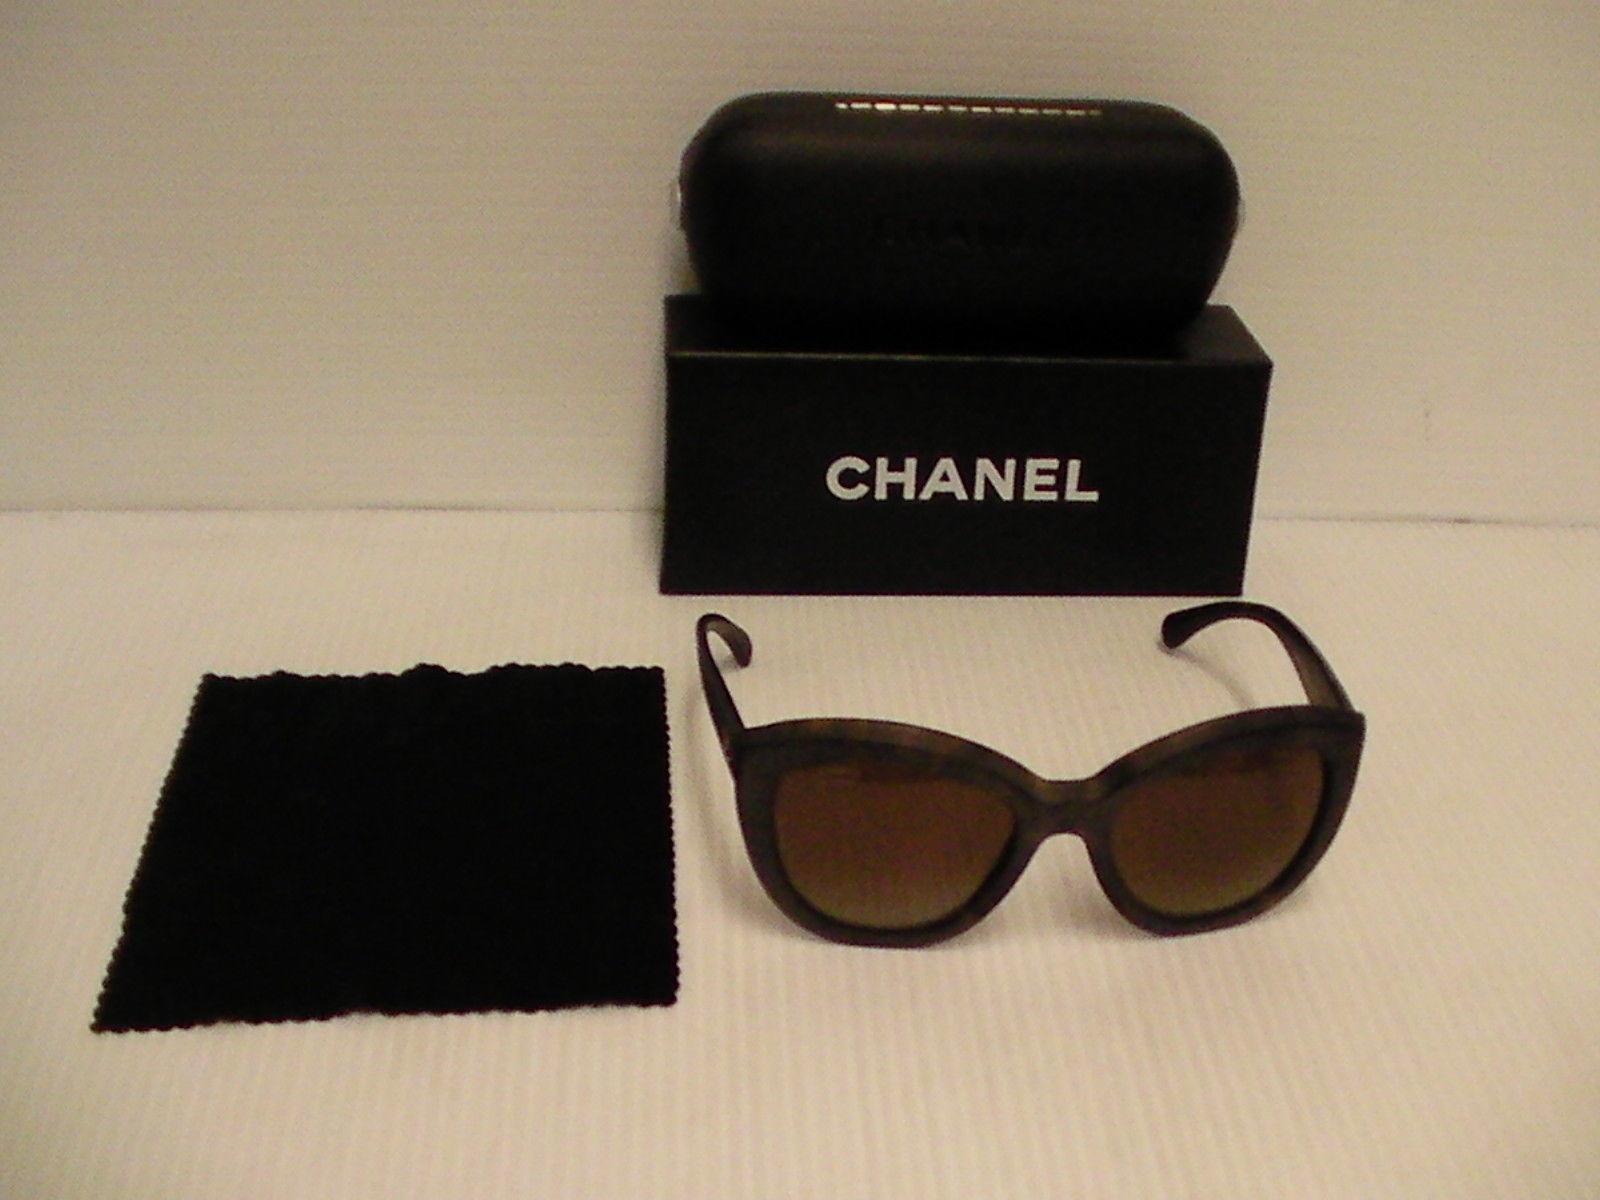 d4c72db8100 Authentic chanel sunglasses 5332 714 s9 polarized brown lenses -  217.75